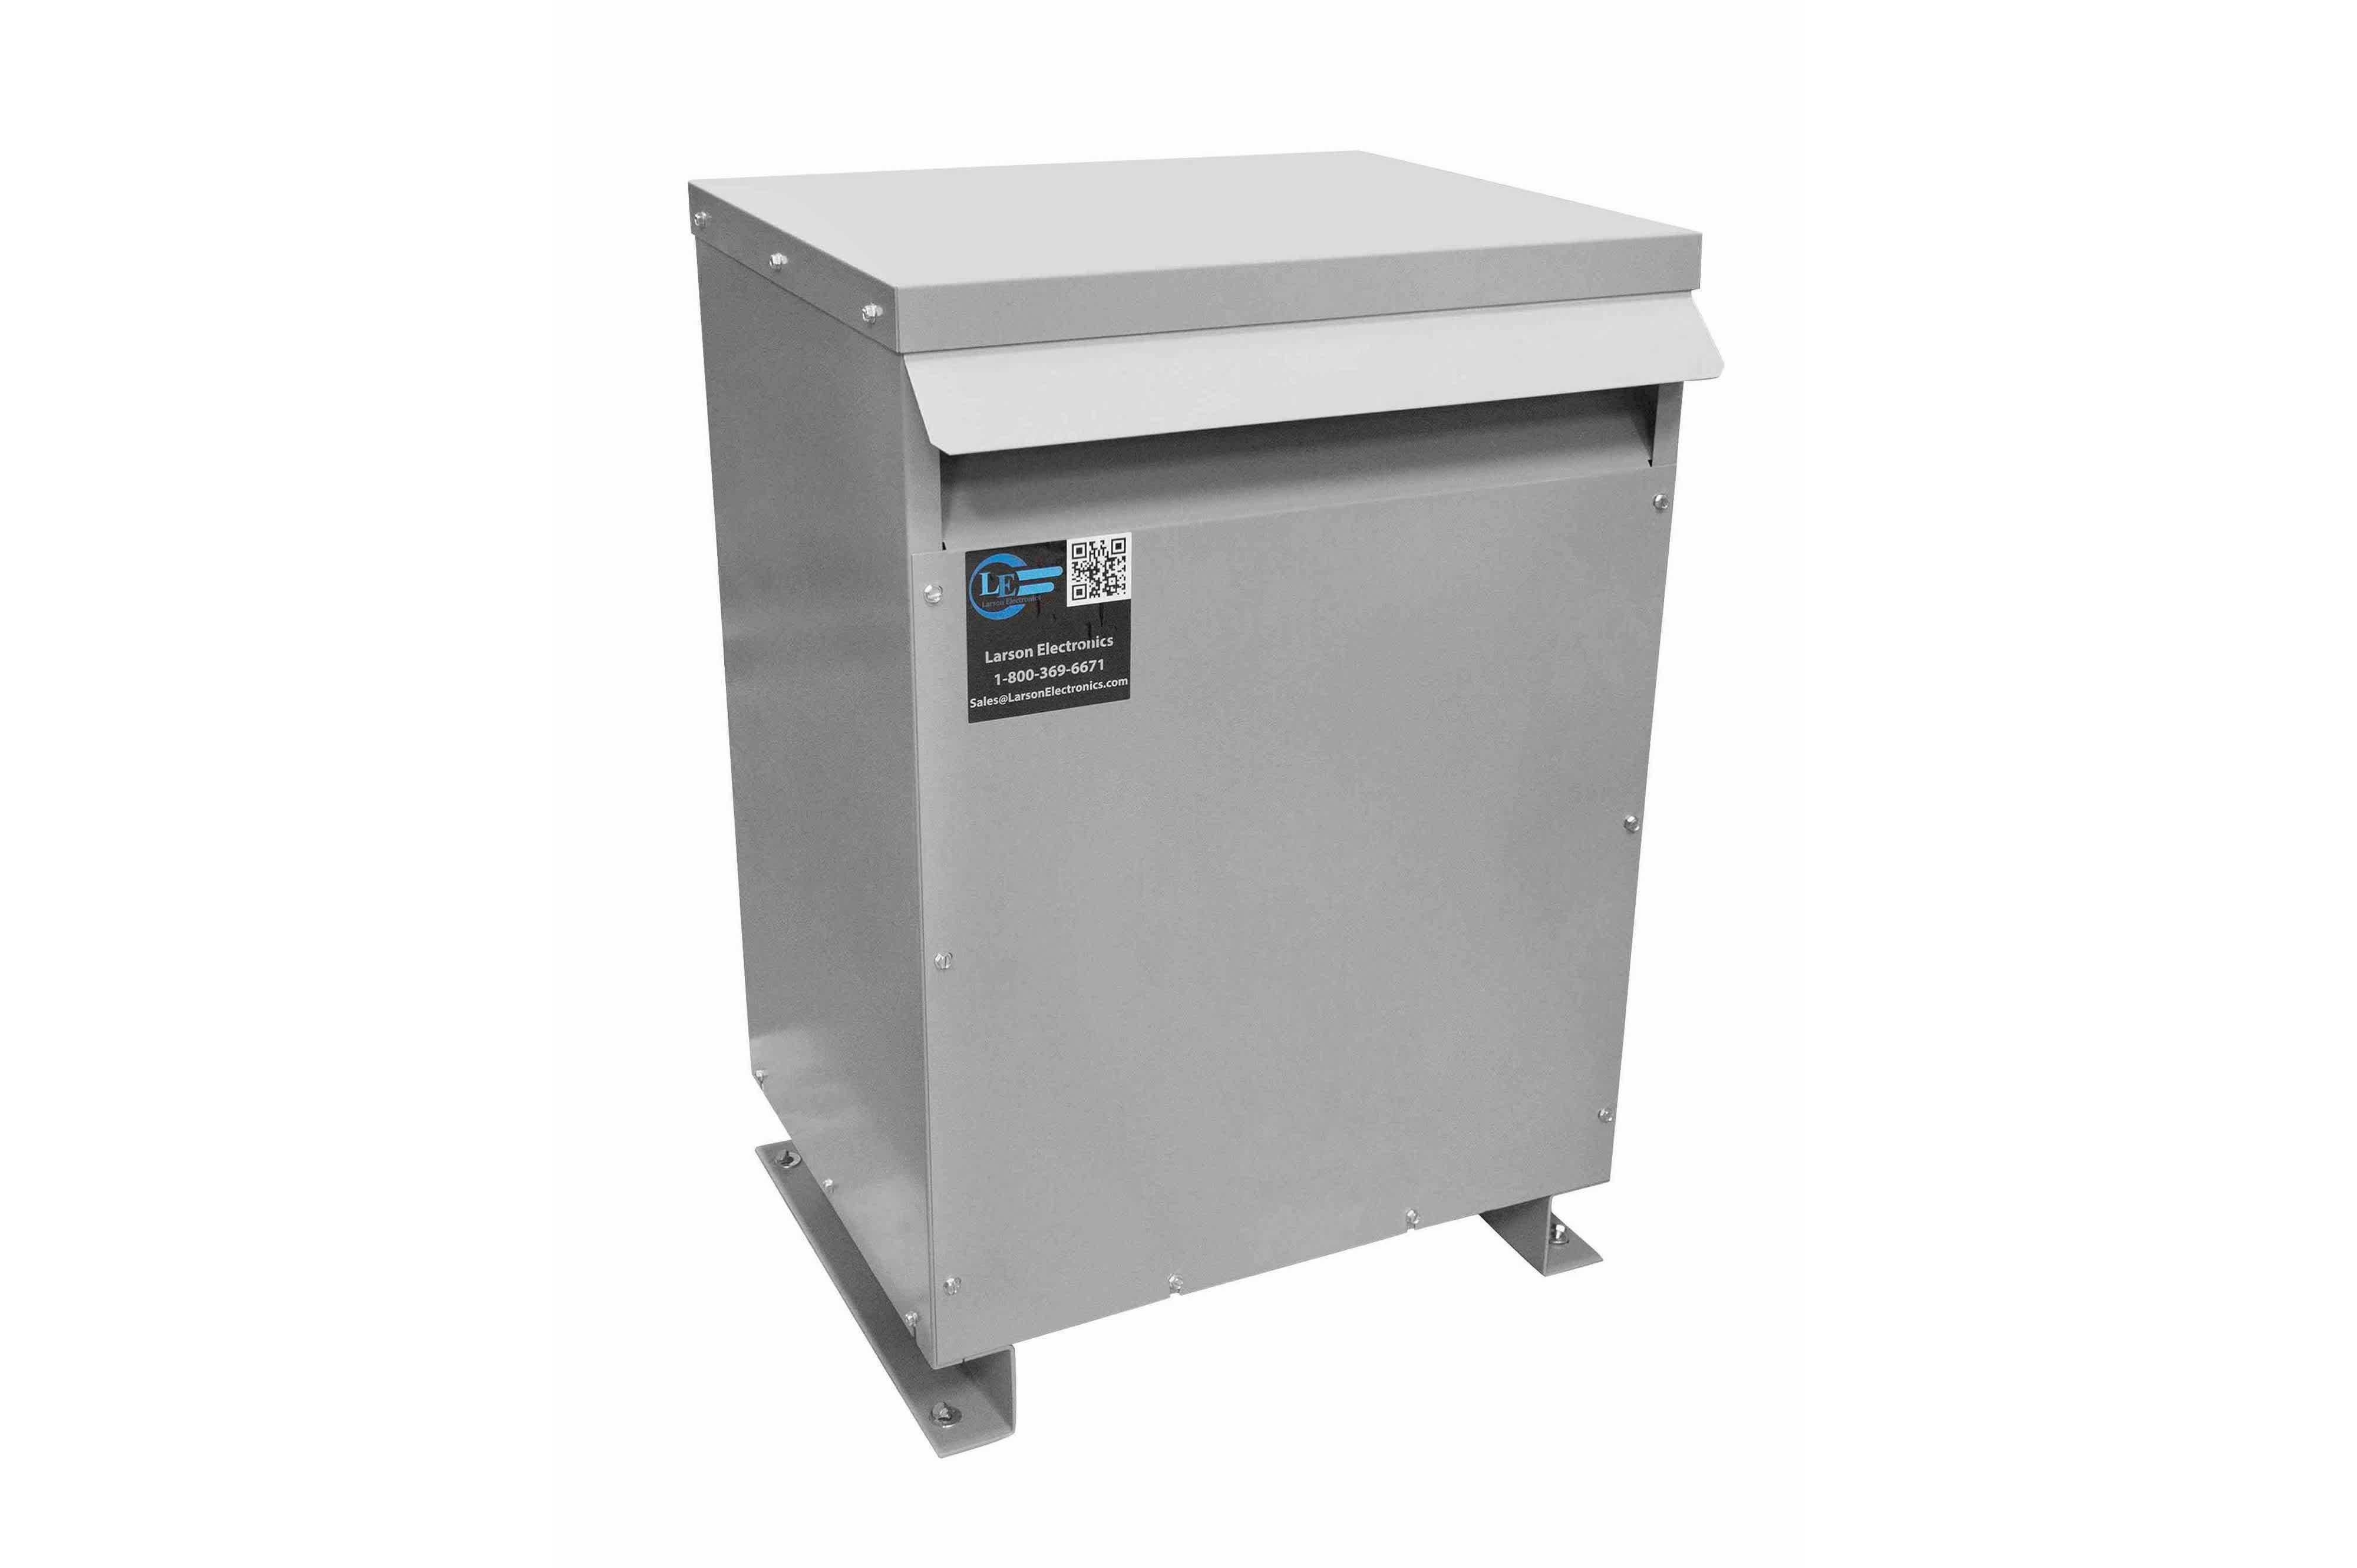 70 kVA 3PH Isolation Transformer, 480V Wye Primary, 380V Delta Secondary, N3R, Ventilated, 60 Hz